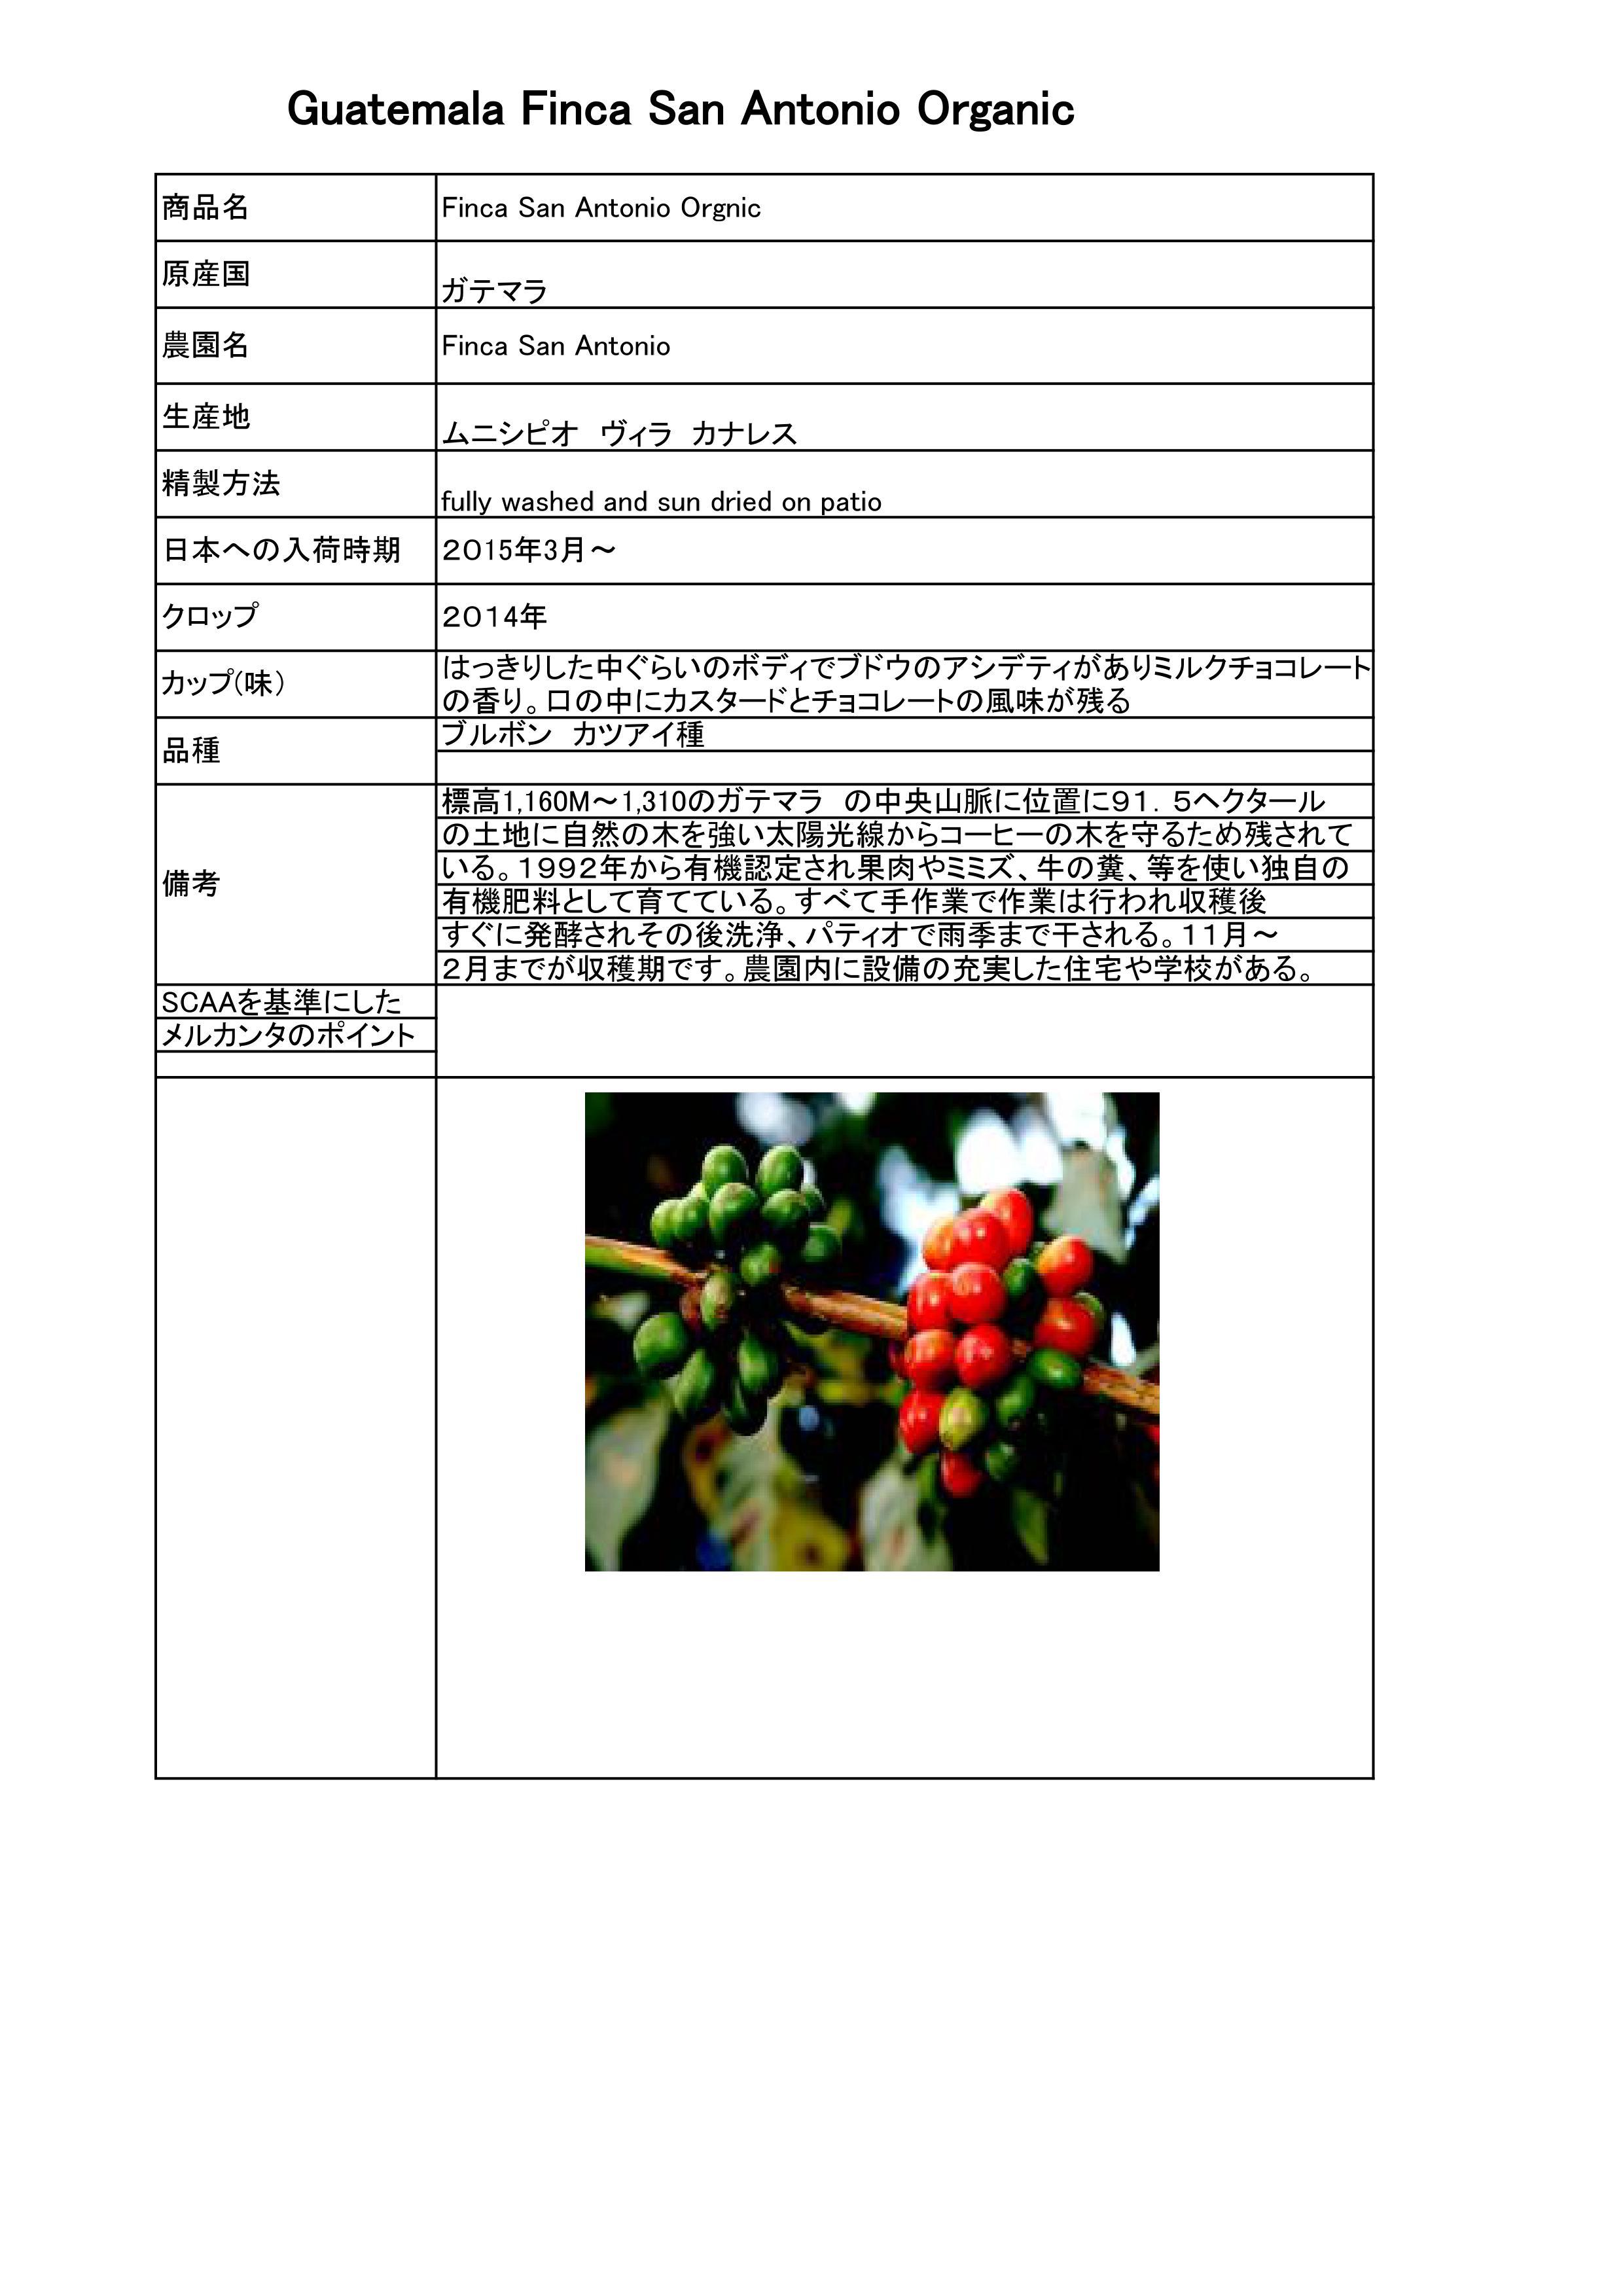 image-0001_20150521145143249.jpg